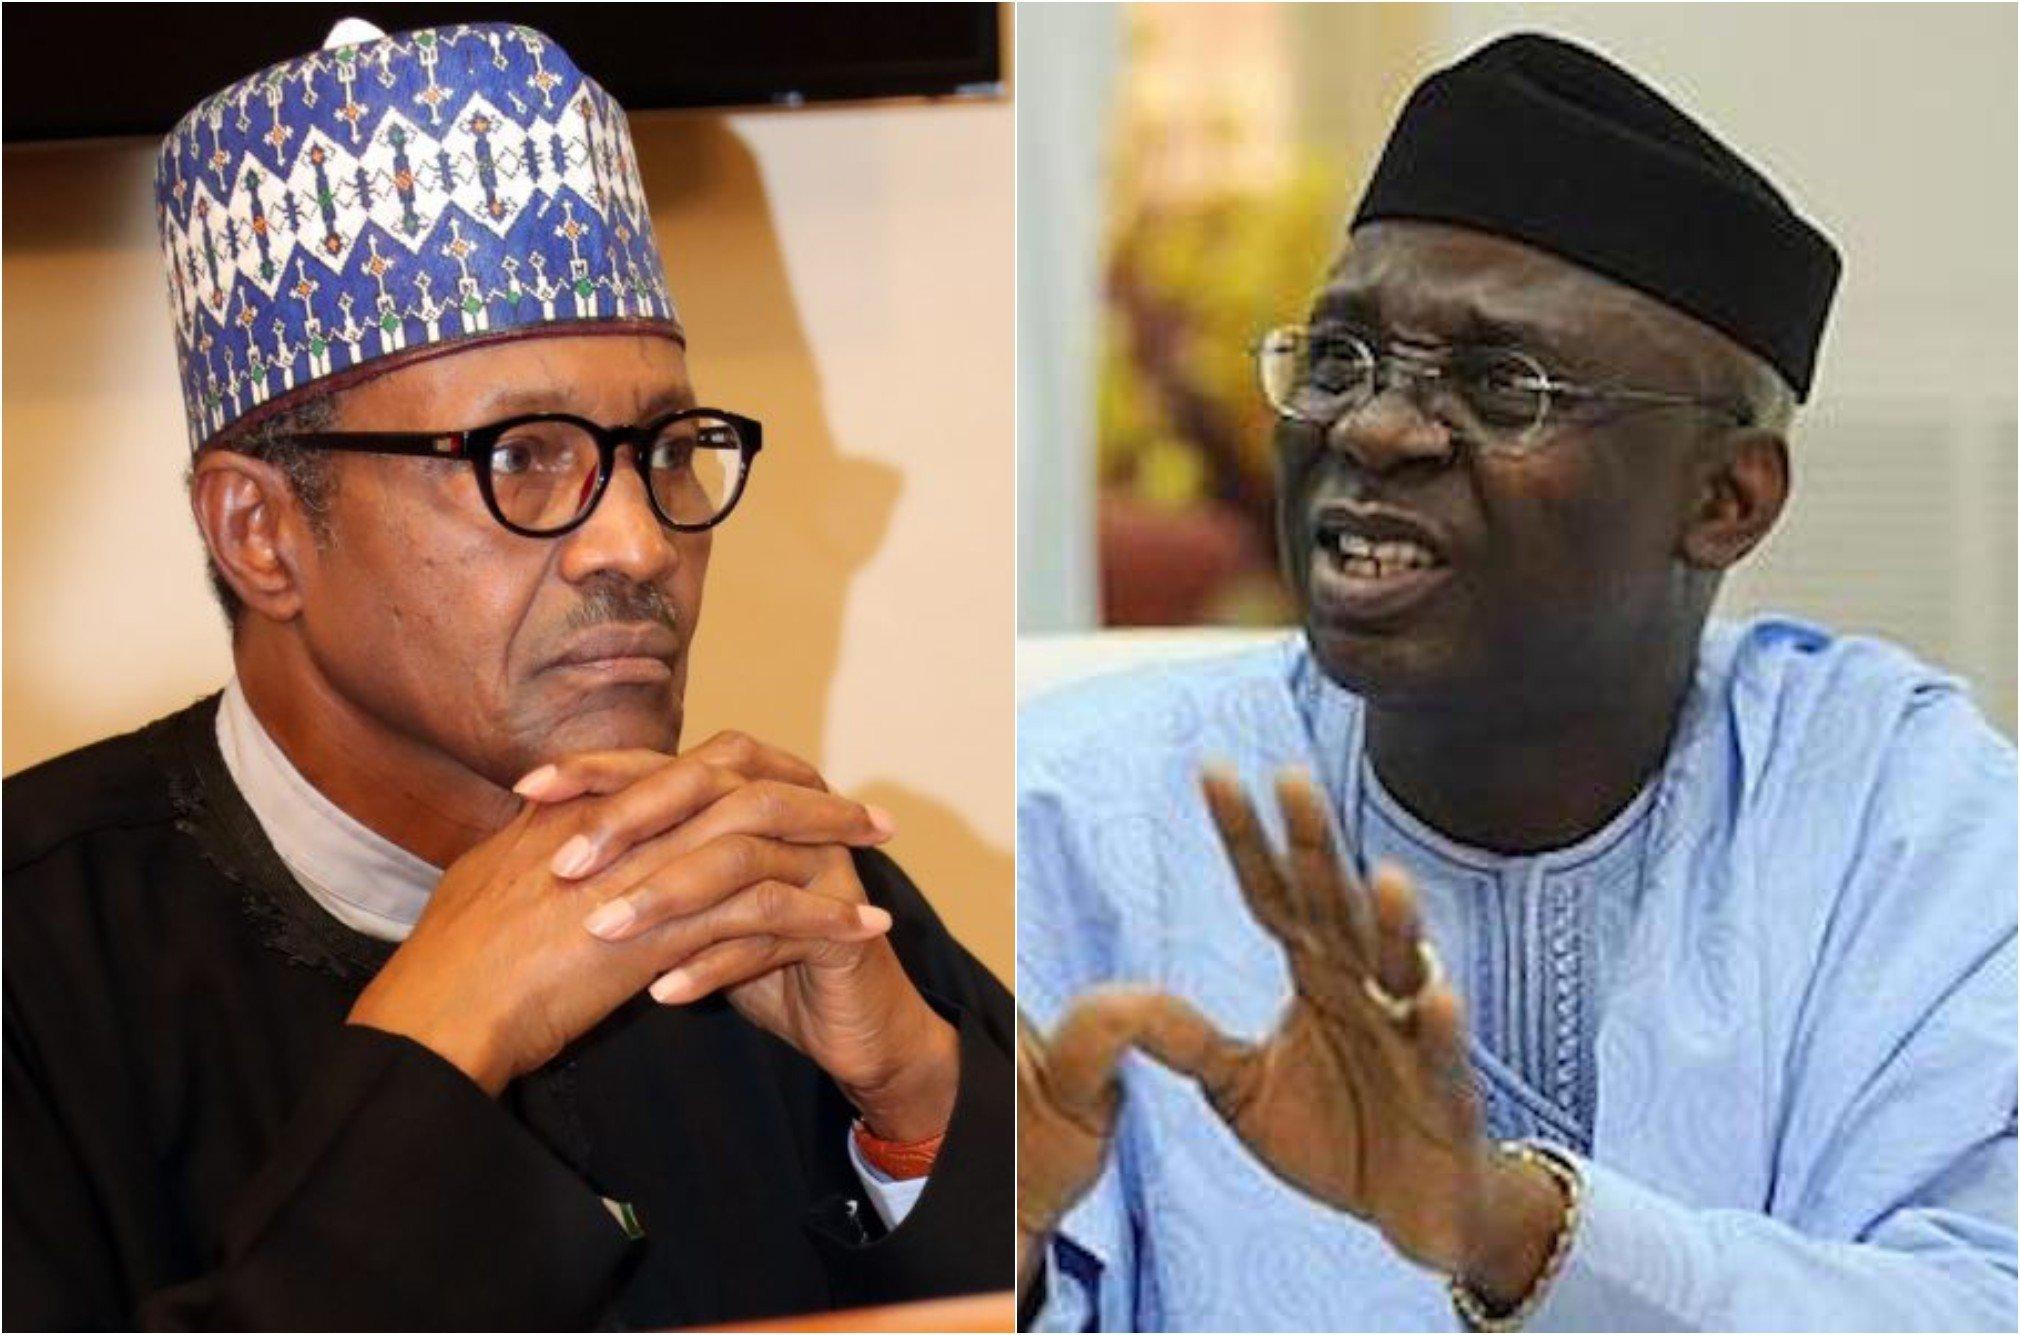 Buhari won't handpick his successor – Femi Adesina replies Pastor Tunde Bakare over advice on 2023 election